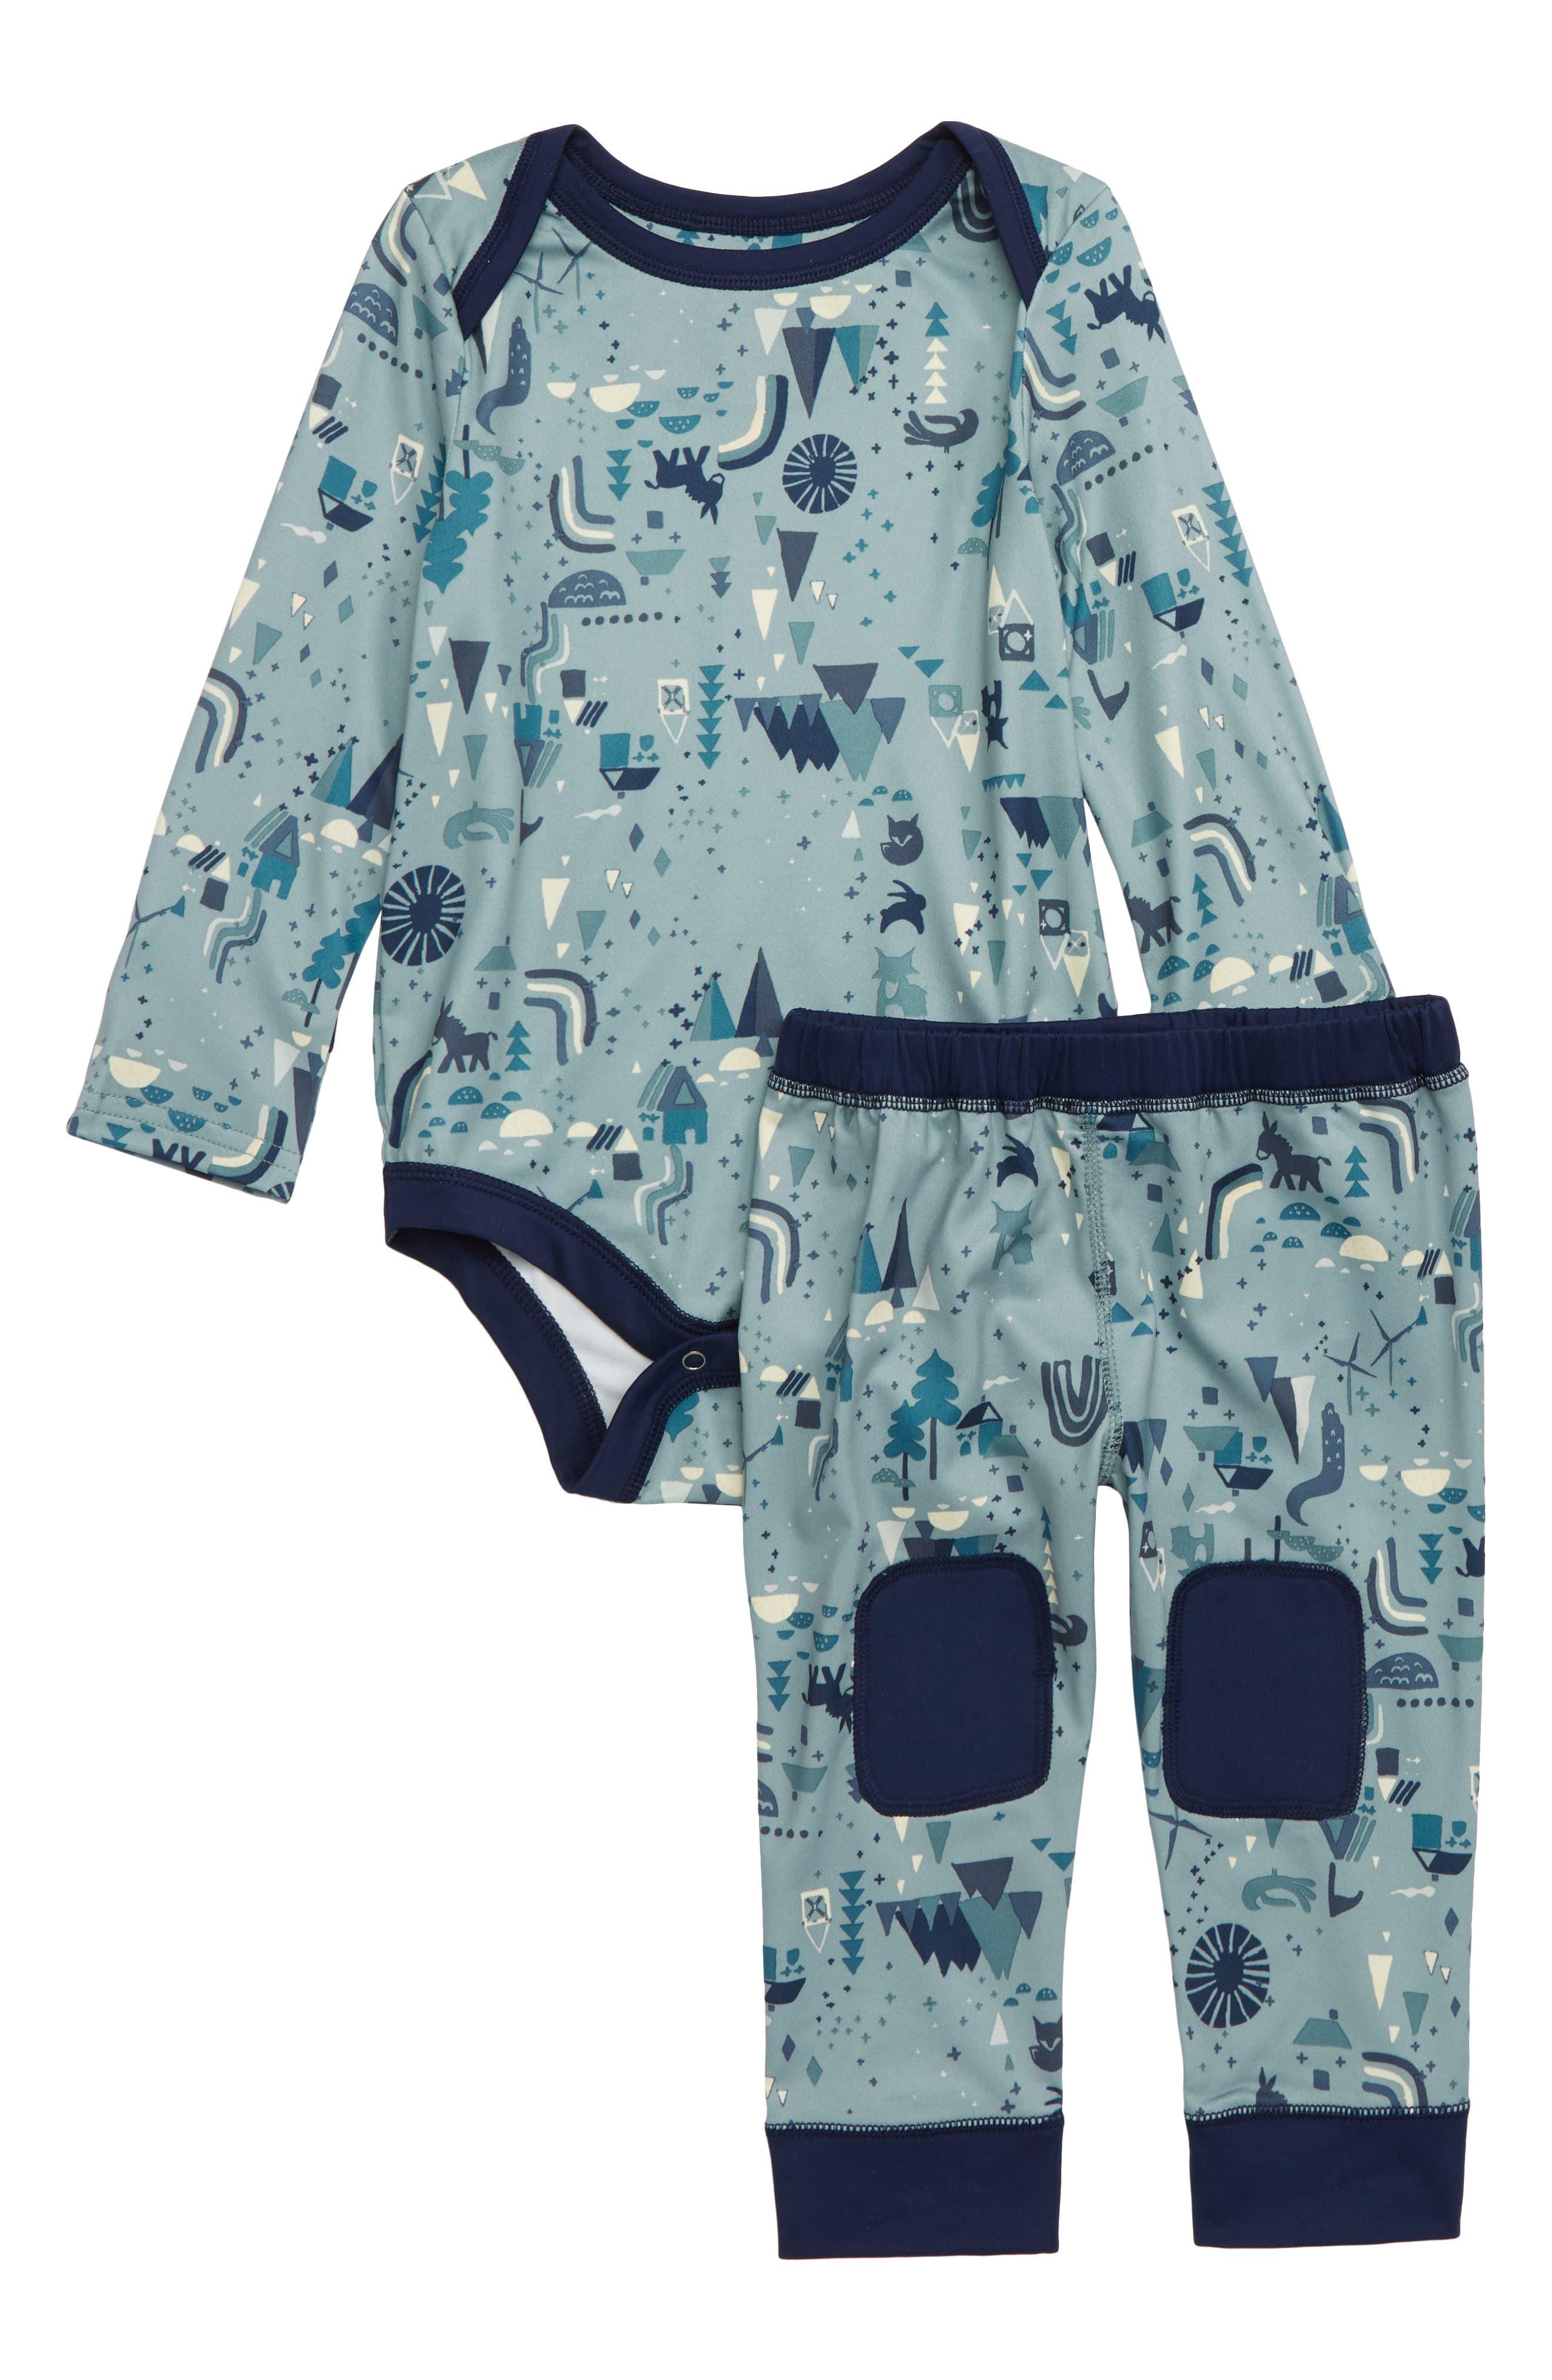 Capilene<sup>®</sup> Base Layer Bodysuit & Leggings,                             Main thumbnail 1, color,                             BHCA BLACK HOUSE CADET BLUE